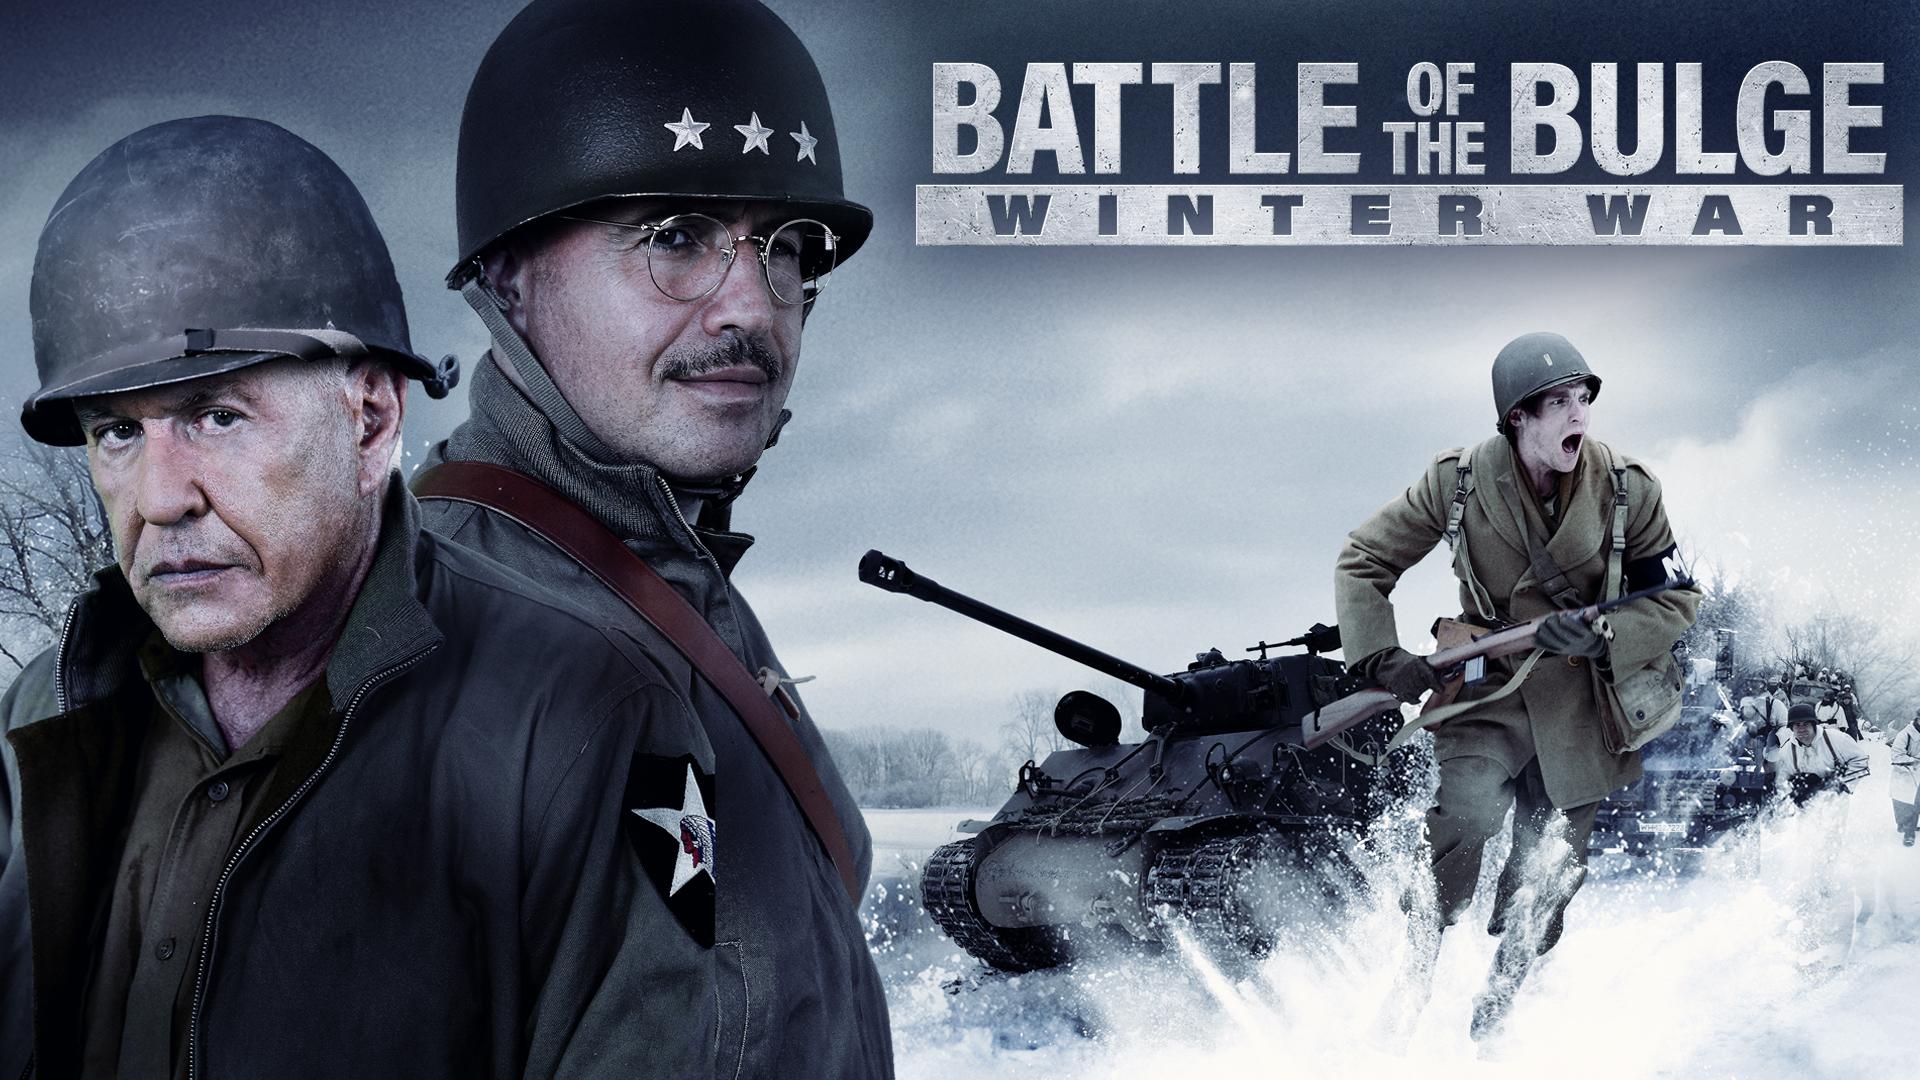 Battle of the Bulge: Winter War